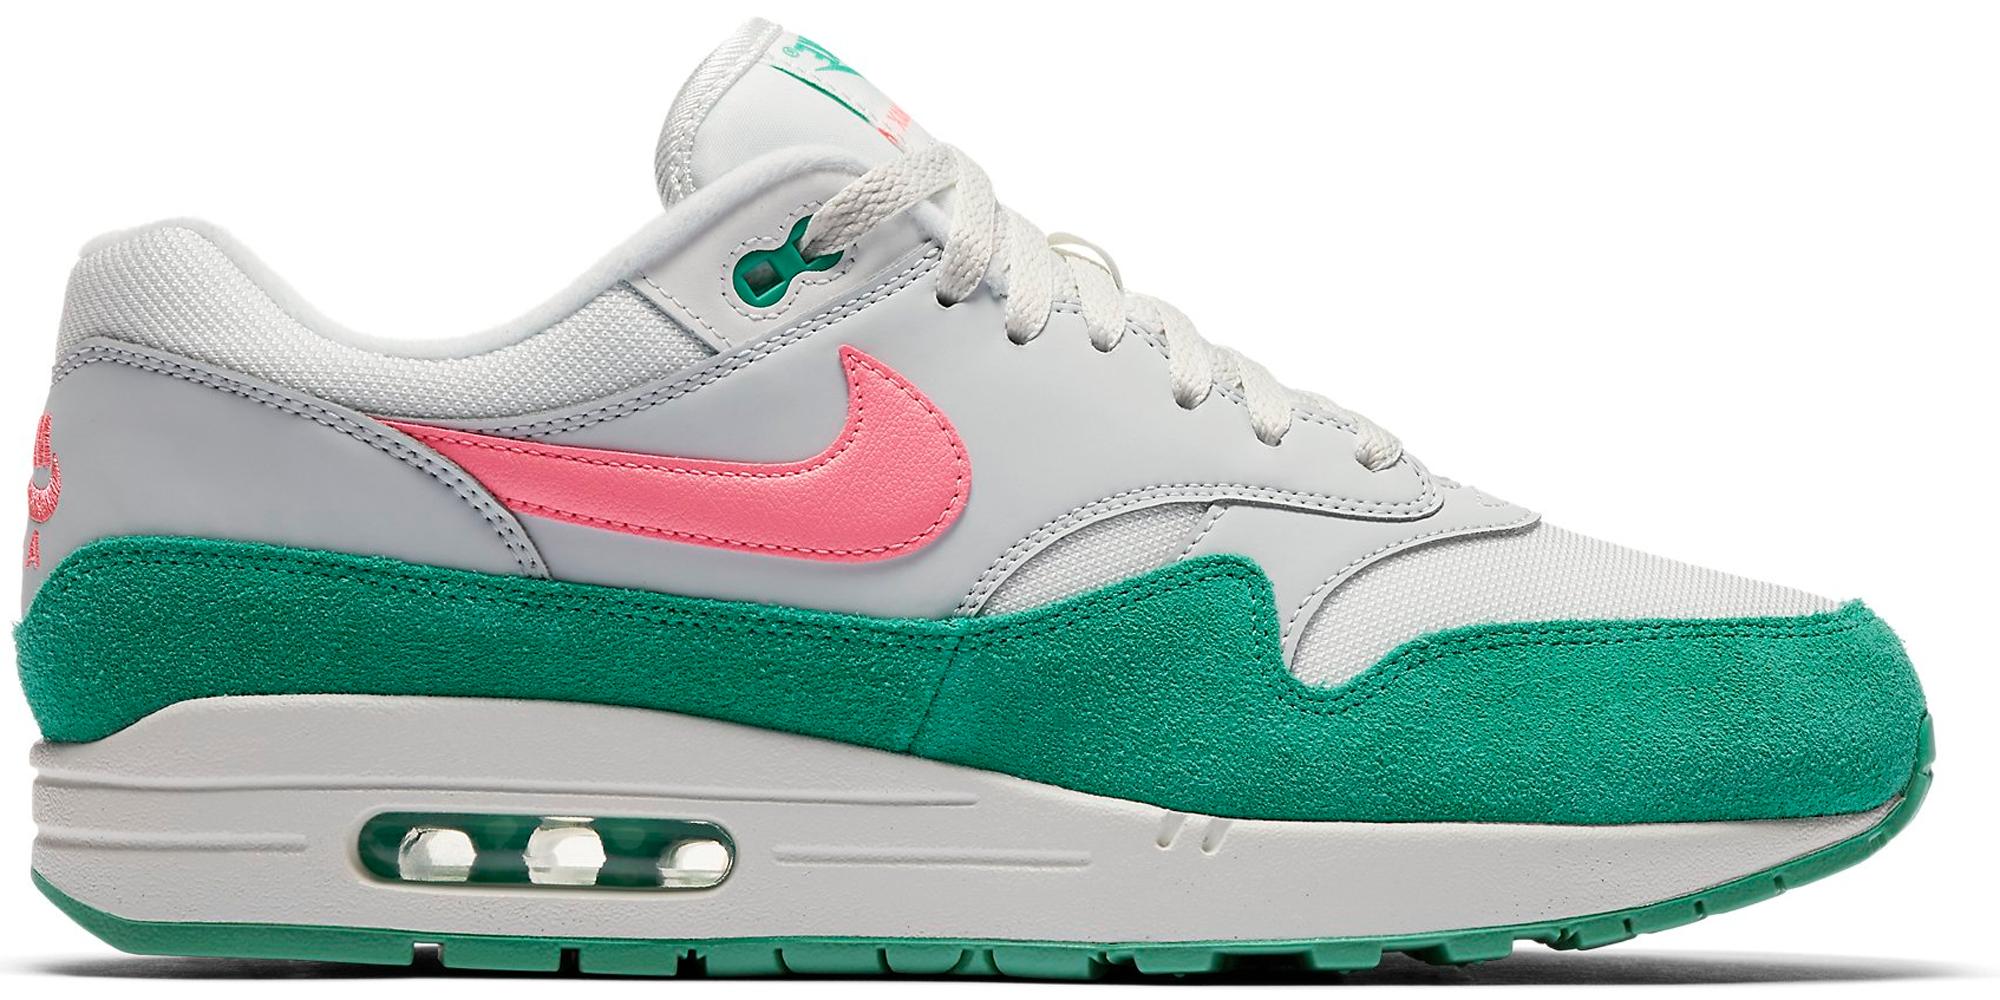 Nike Air Max 1 Watermelon Schoenen Kleding